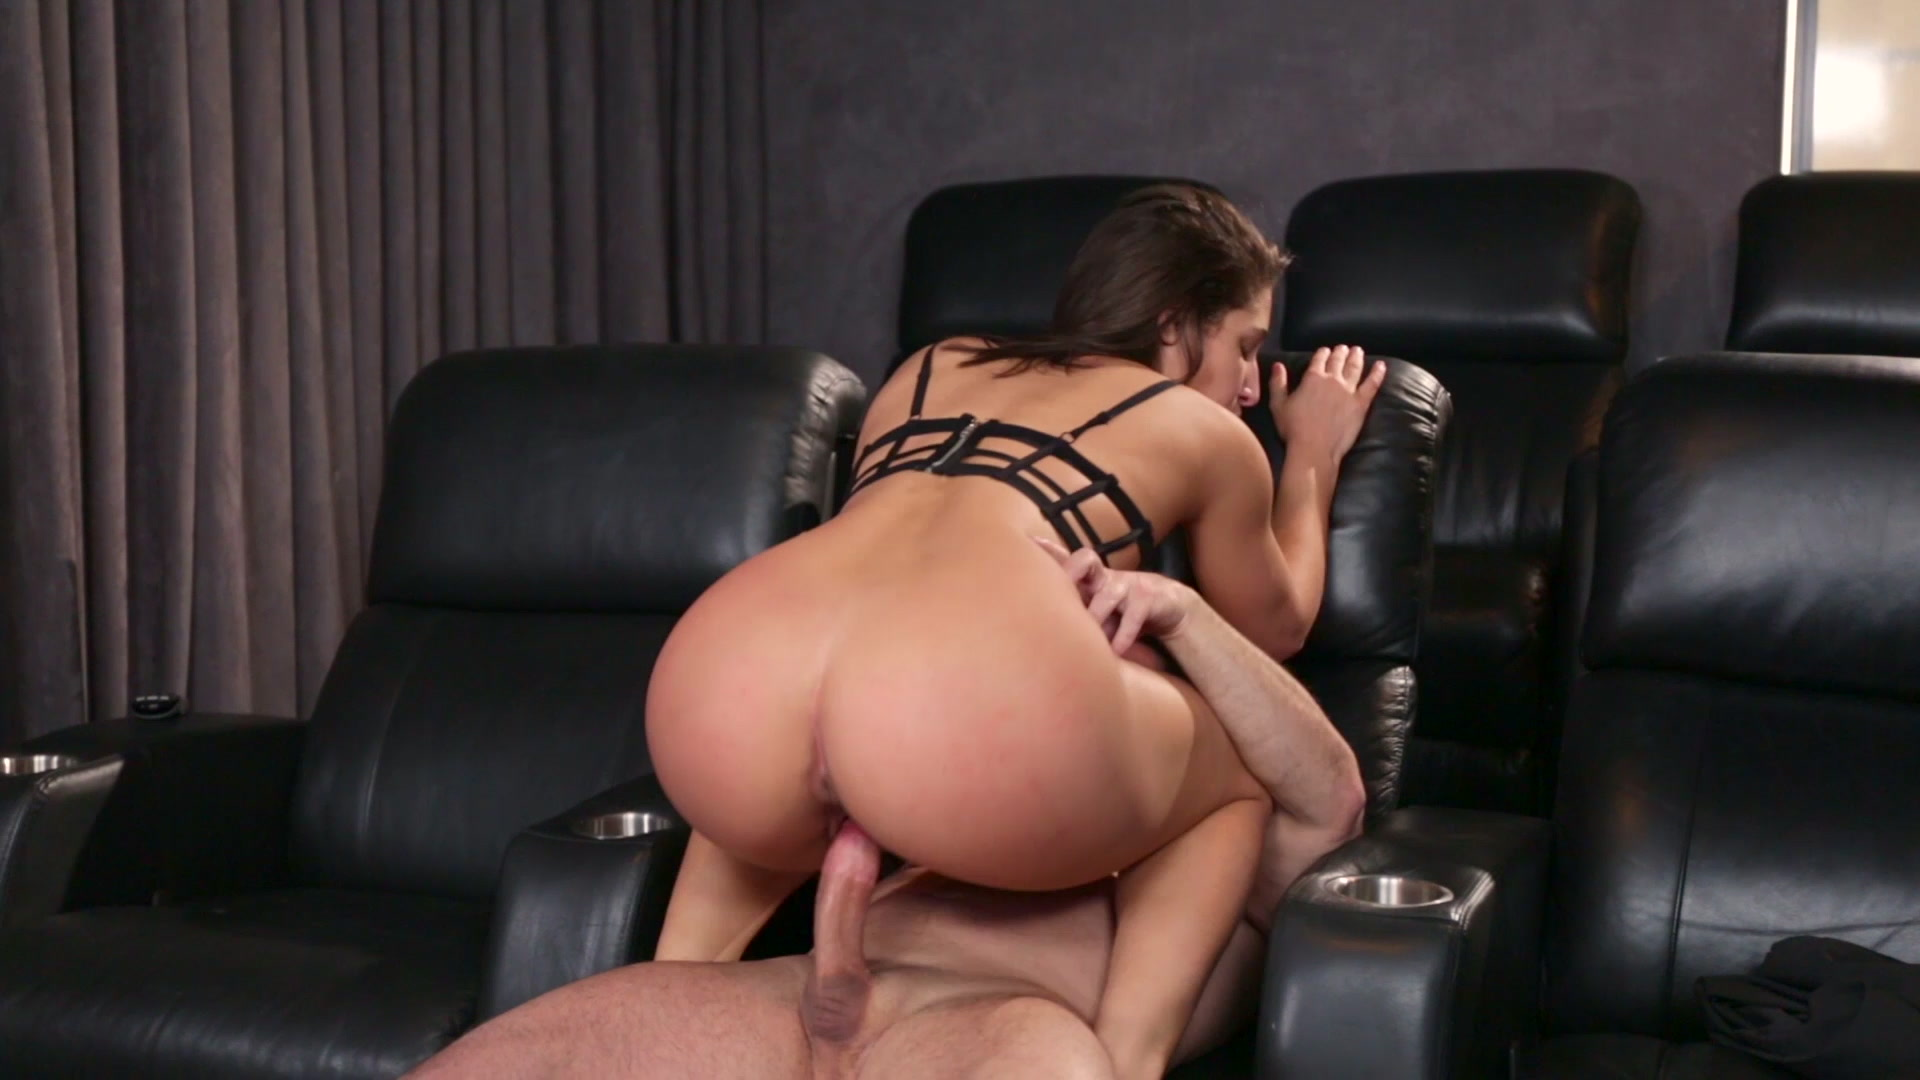 Infidelity wife porn galery